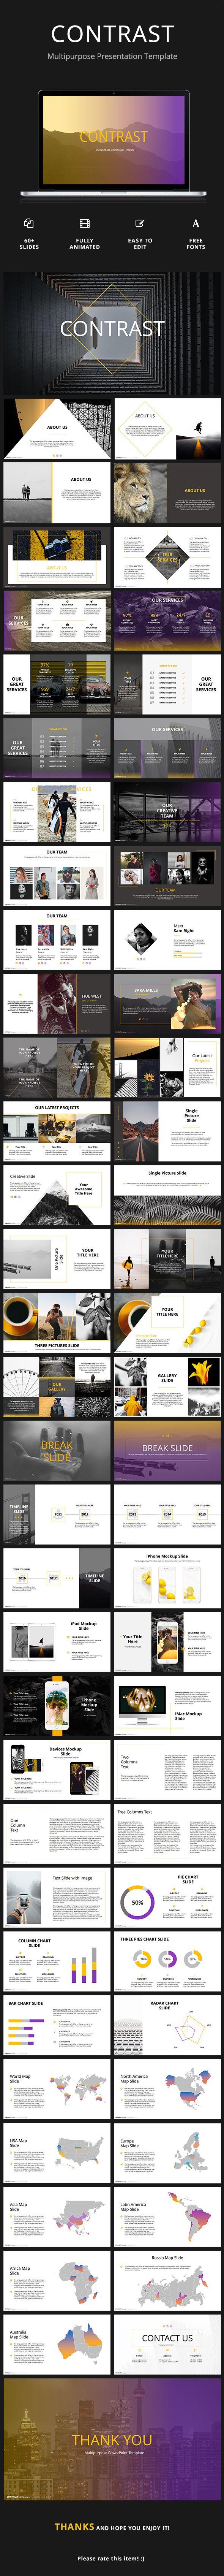 Contrast - Creative Google Slides Template | Presentation templates ...